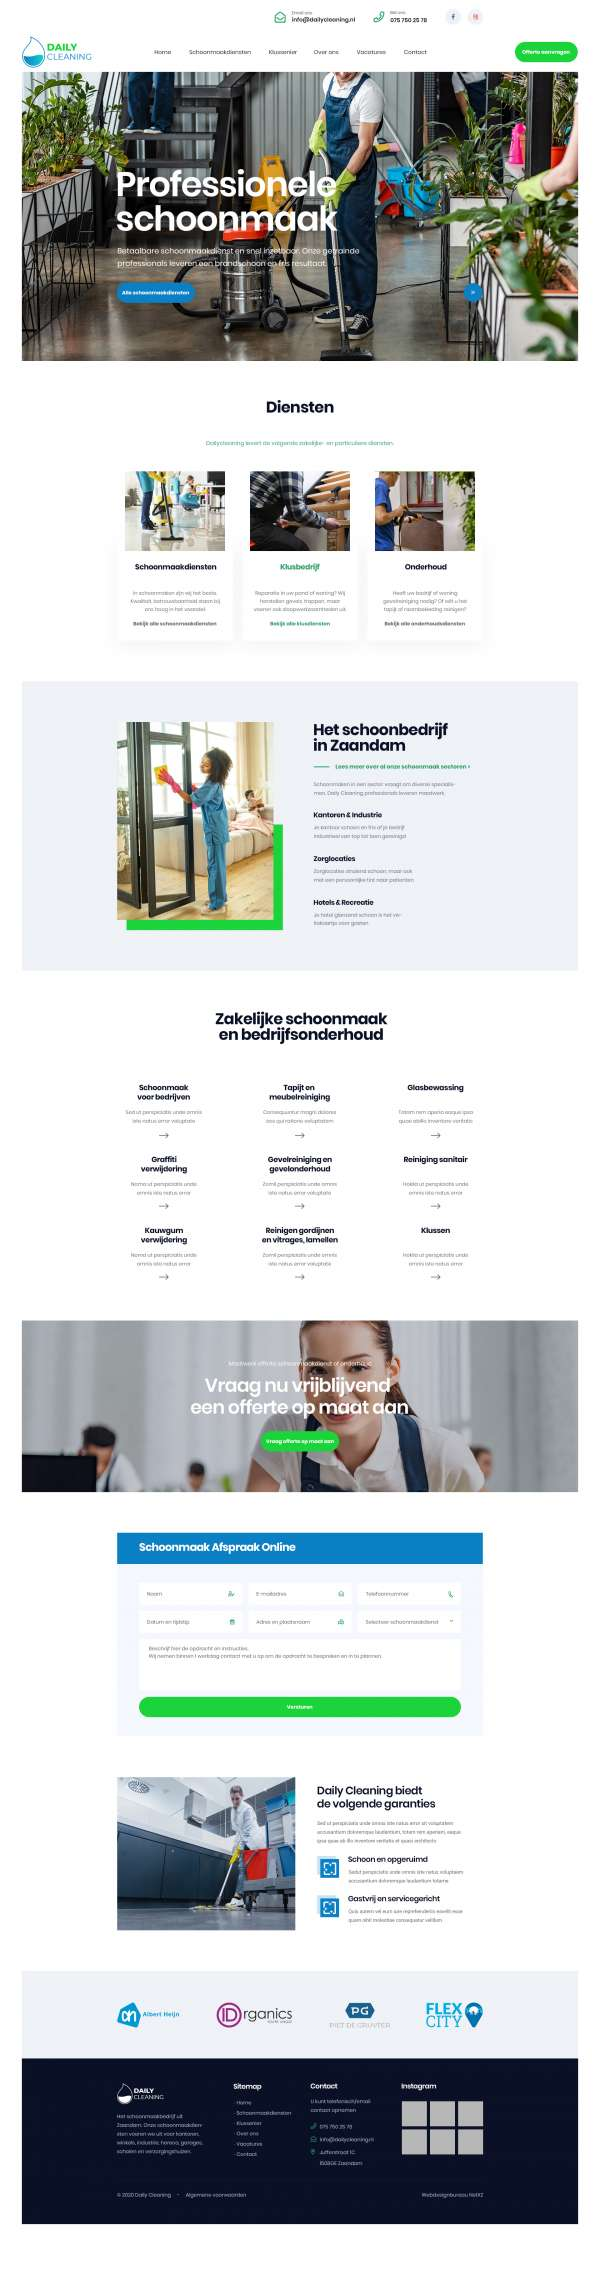 webdesign_Amsterdam_NetXZ_4.jpg